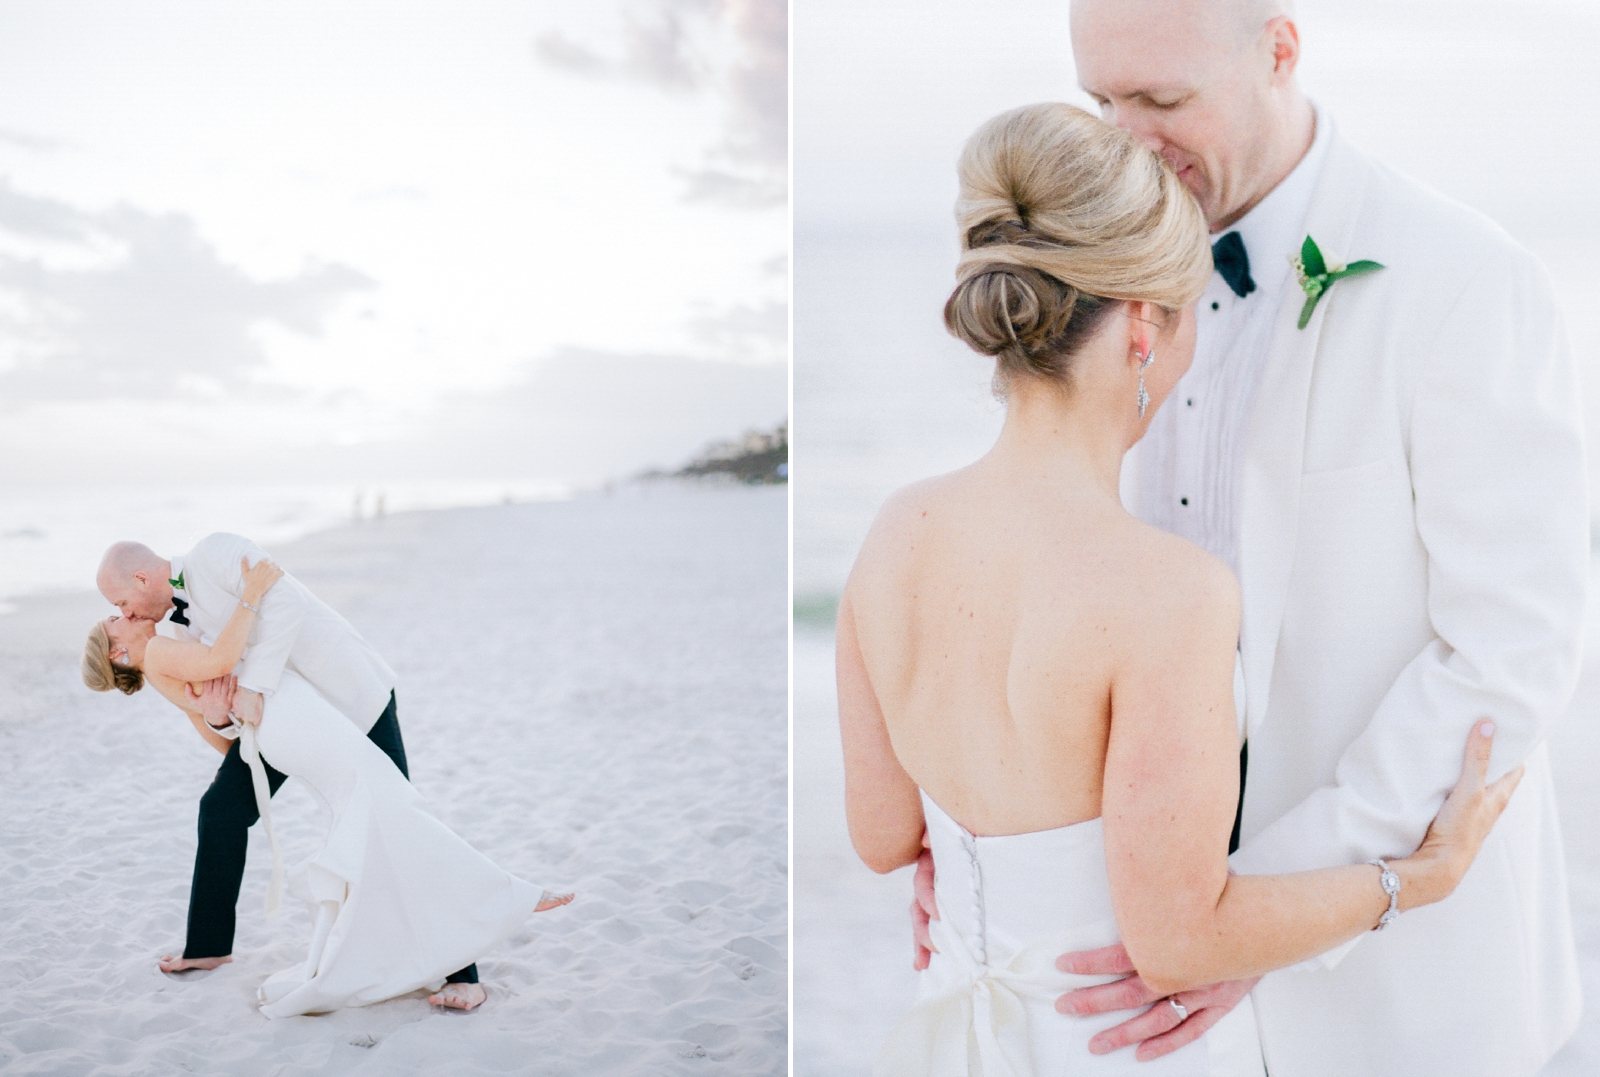 rosemary beach wedding photographer st augustine green rosemary beach shannon griffin_0003.jpg